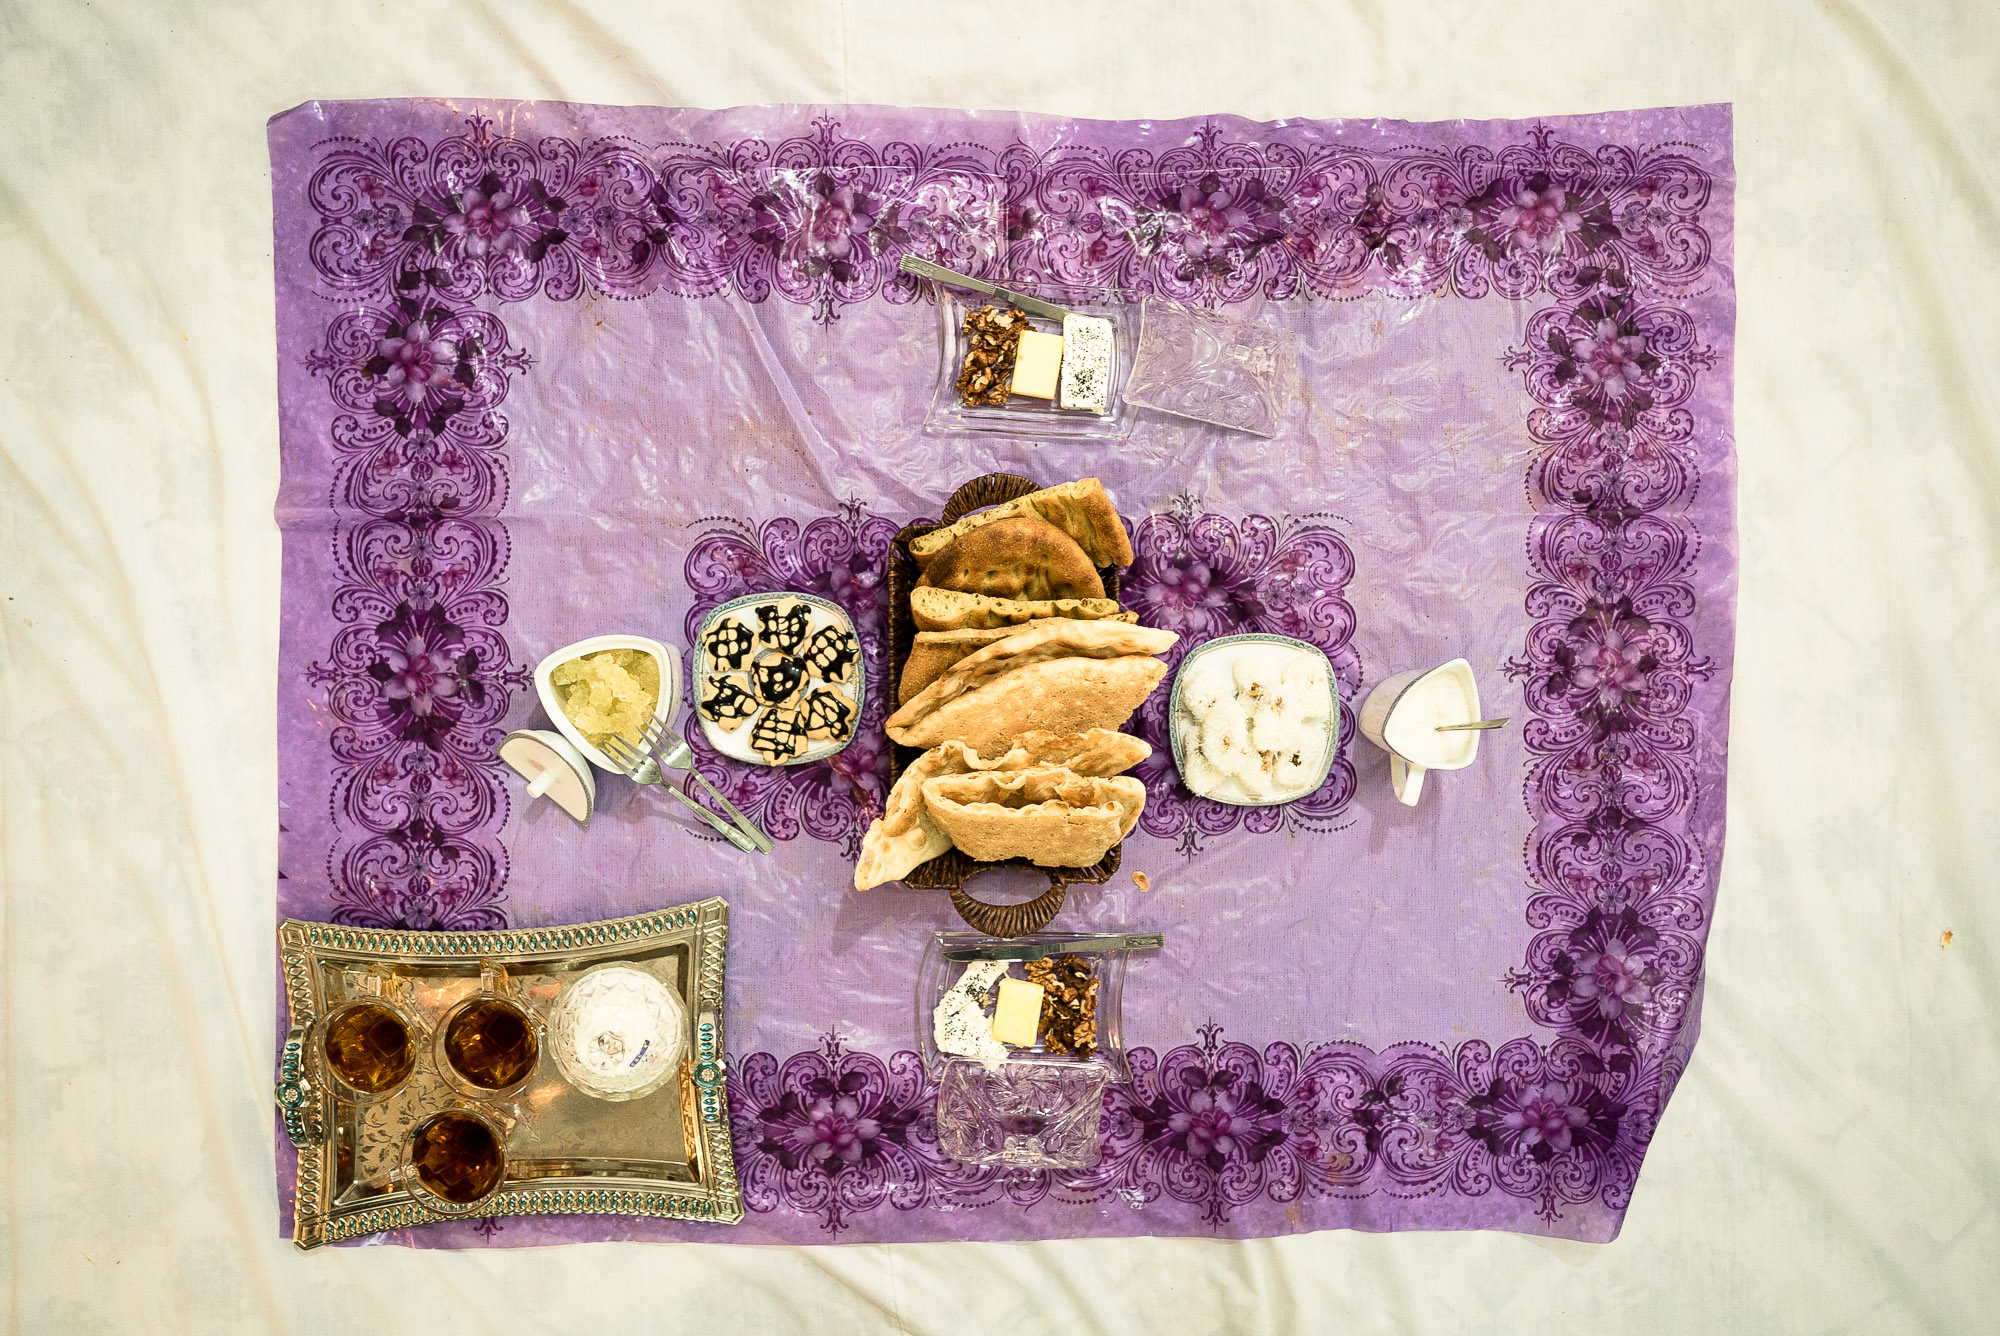 breakfast in Mahdi's place